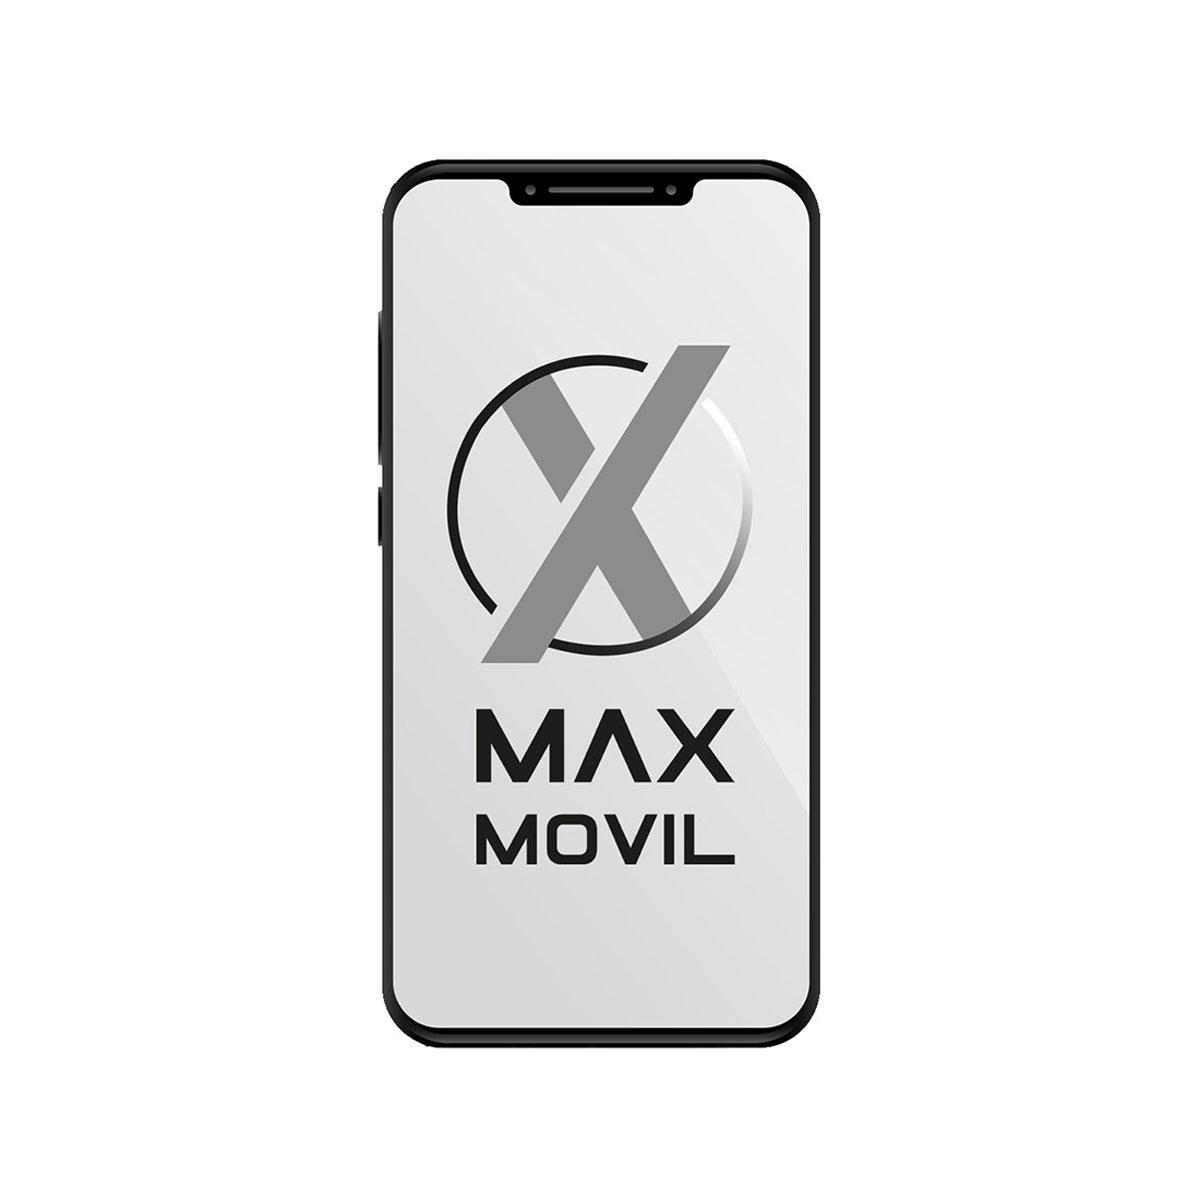 Apple iPhone XS Reacondicionado 64GB Plata (Silver)